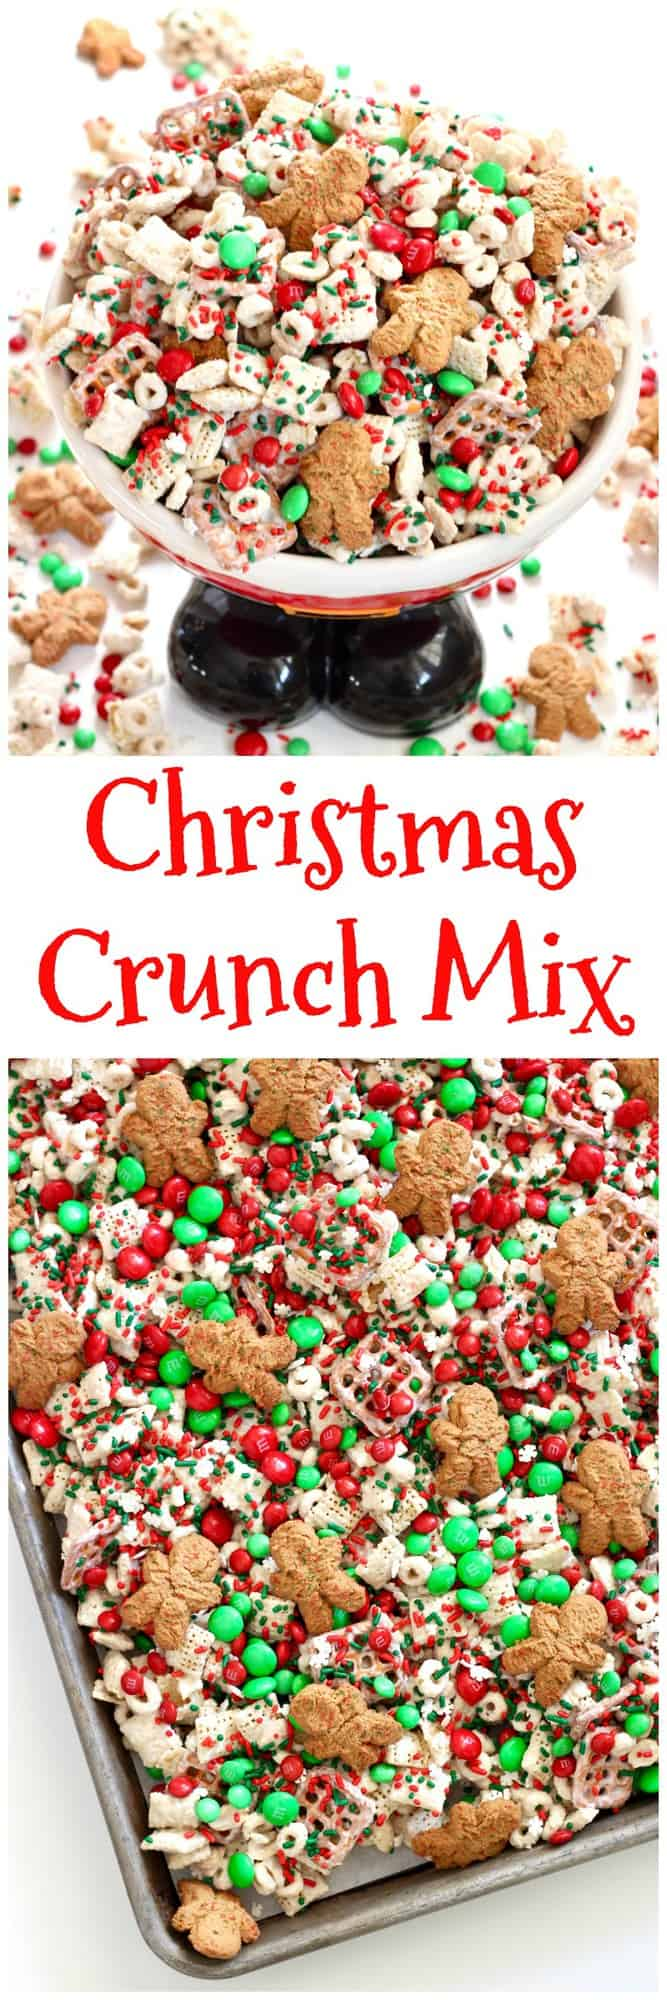 Christmas Crunch Mix